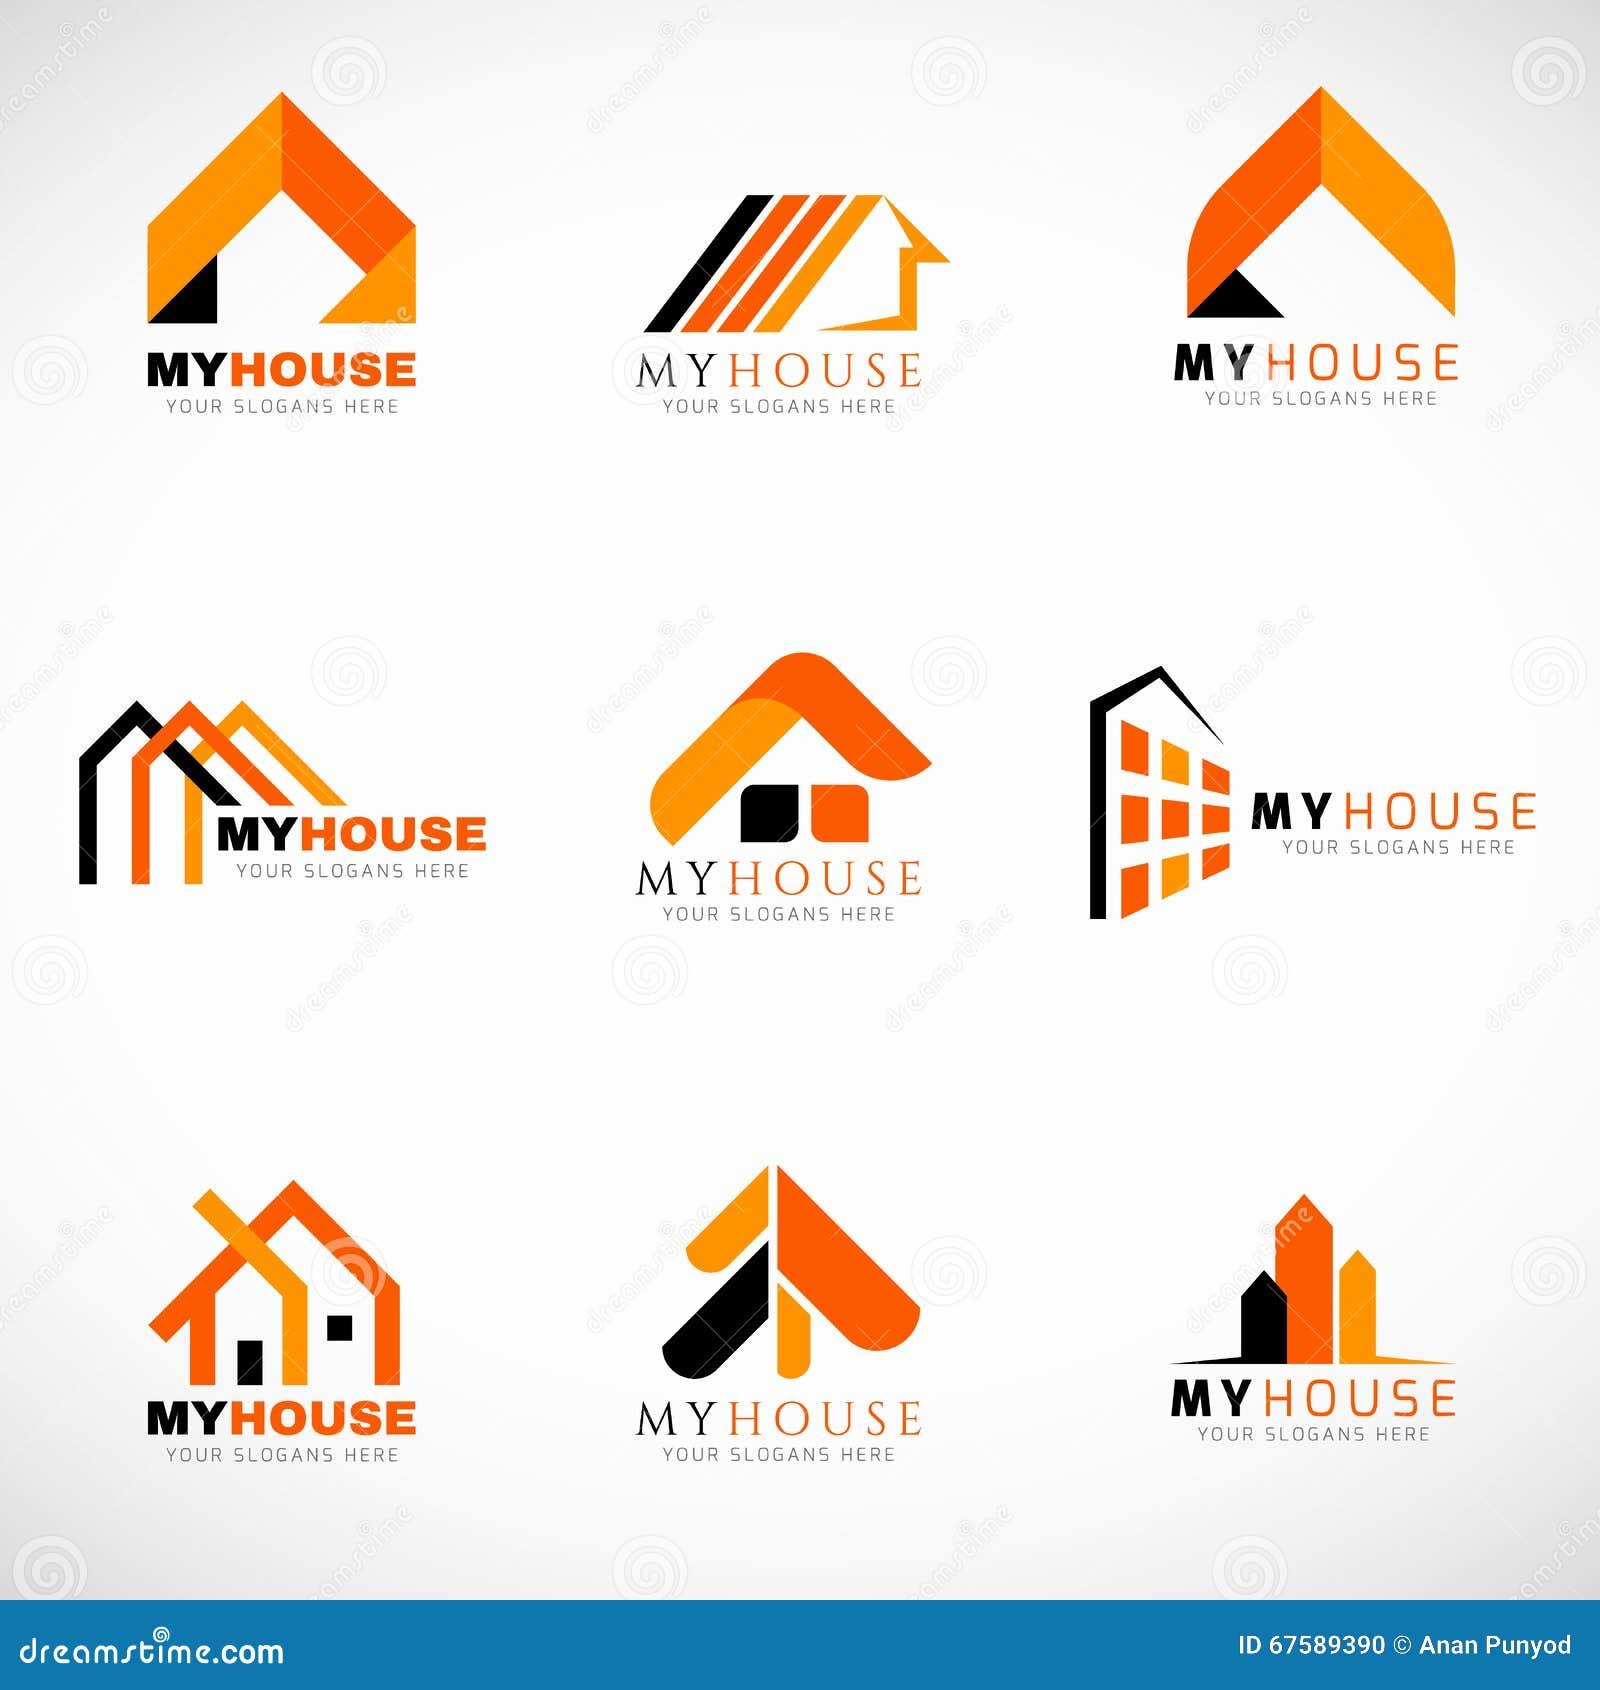 Logomatics  Logo Design Packages Online!